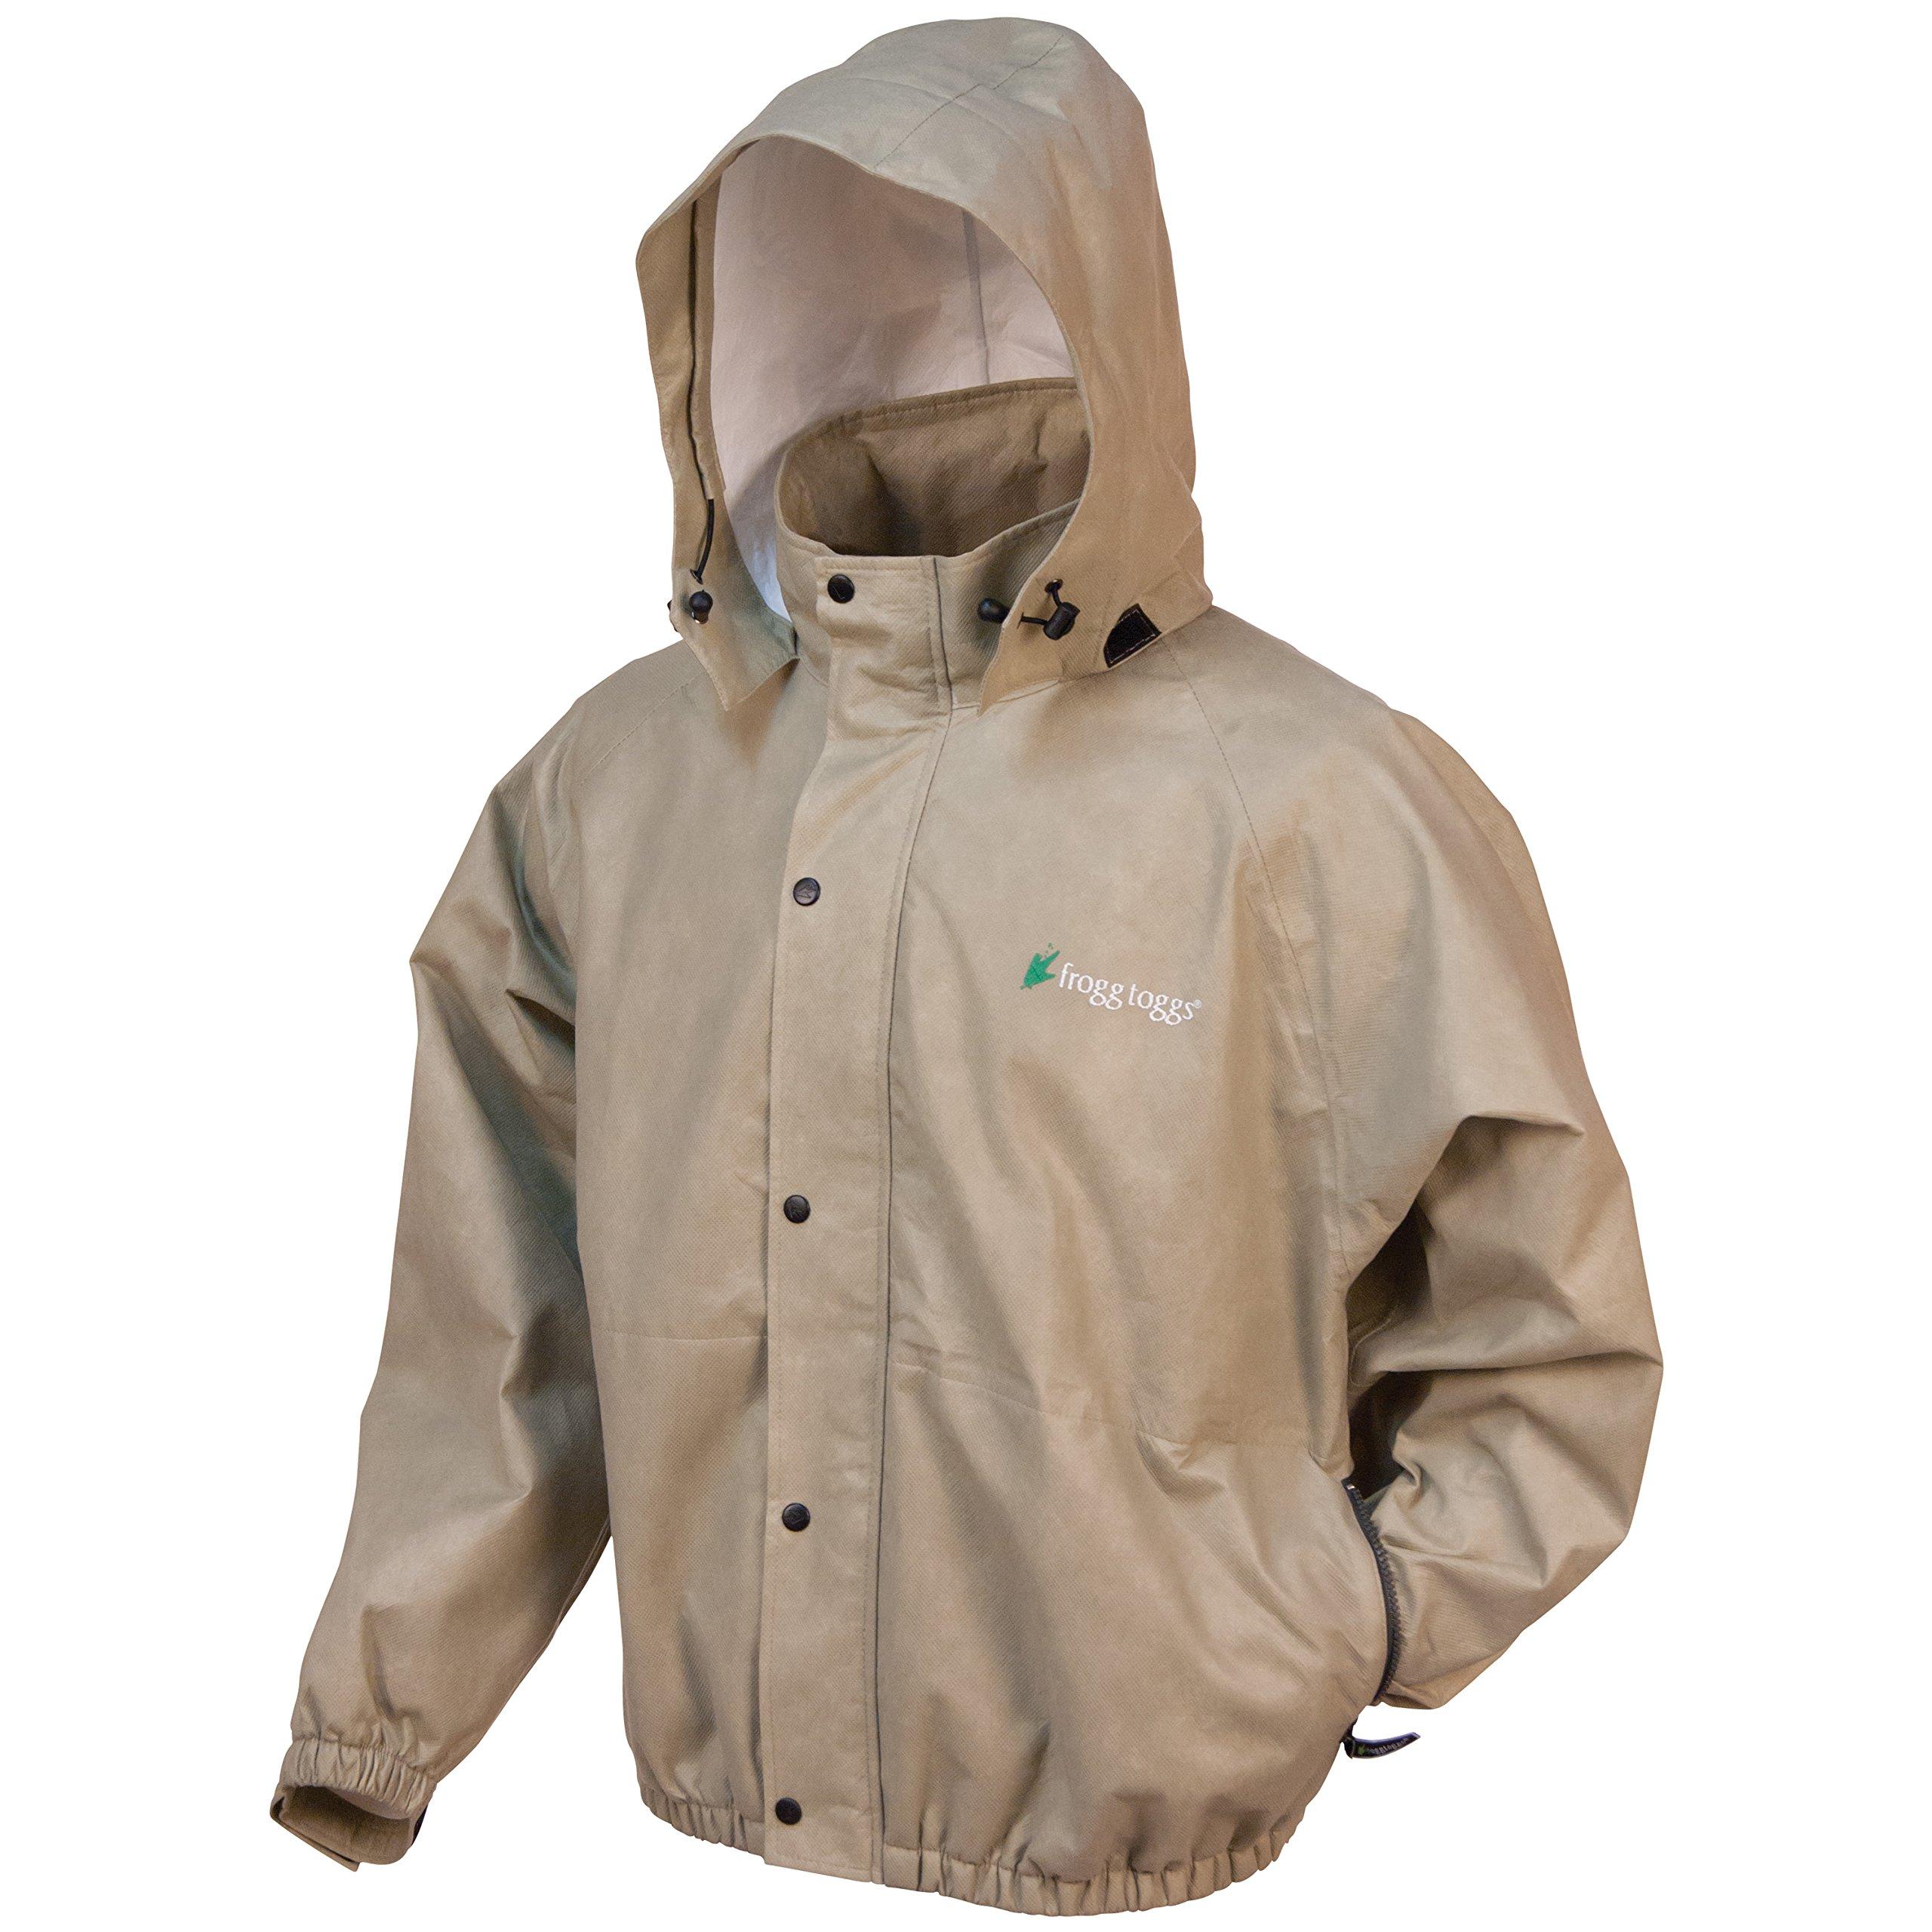 Frogg Toggs Classic Pro Action Rain Jacket with Pockets, Khaki, Size Small